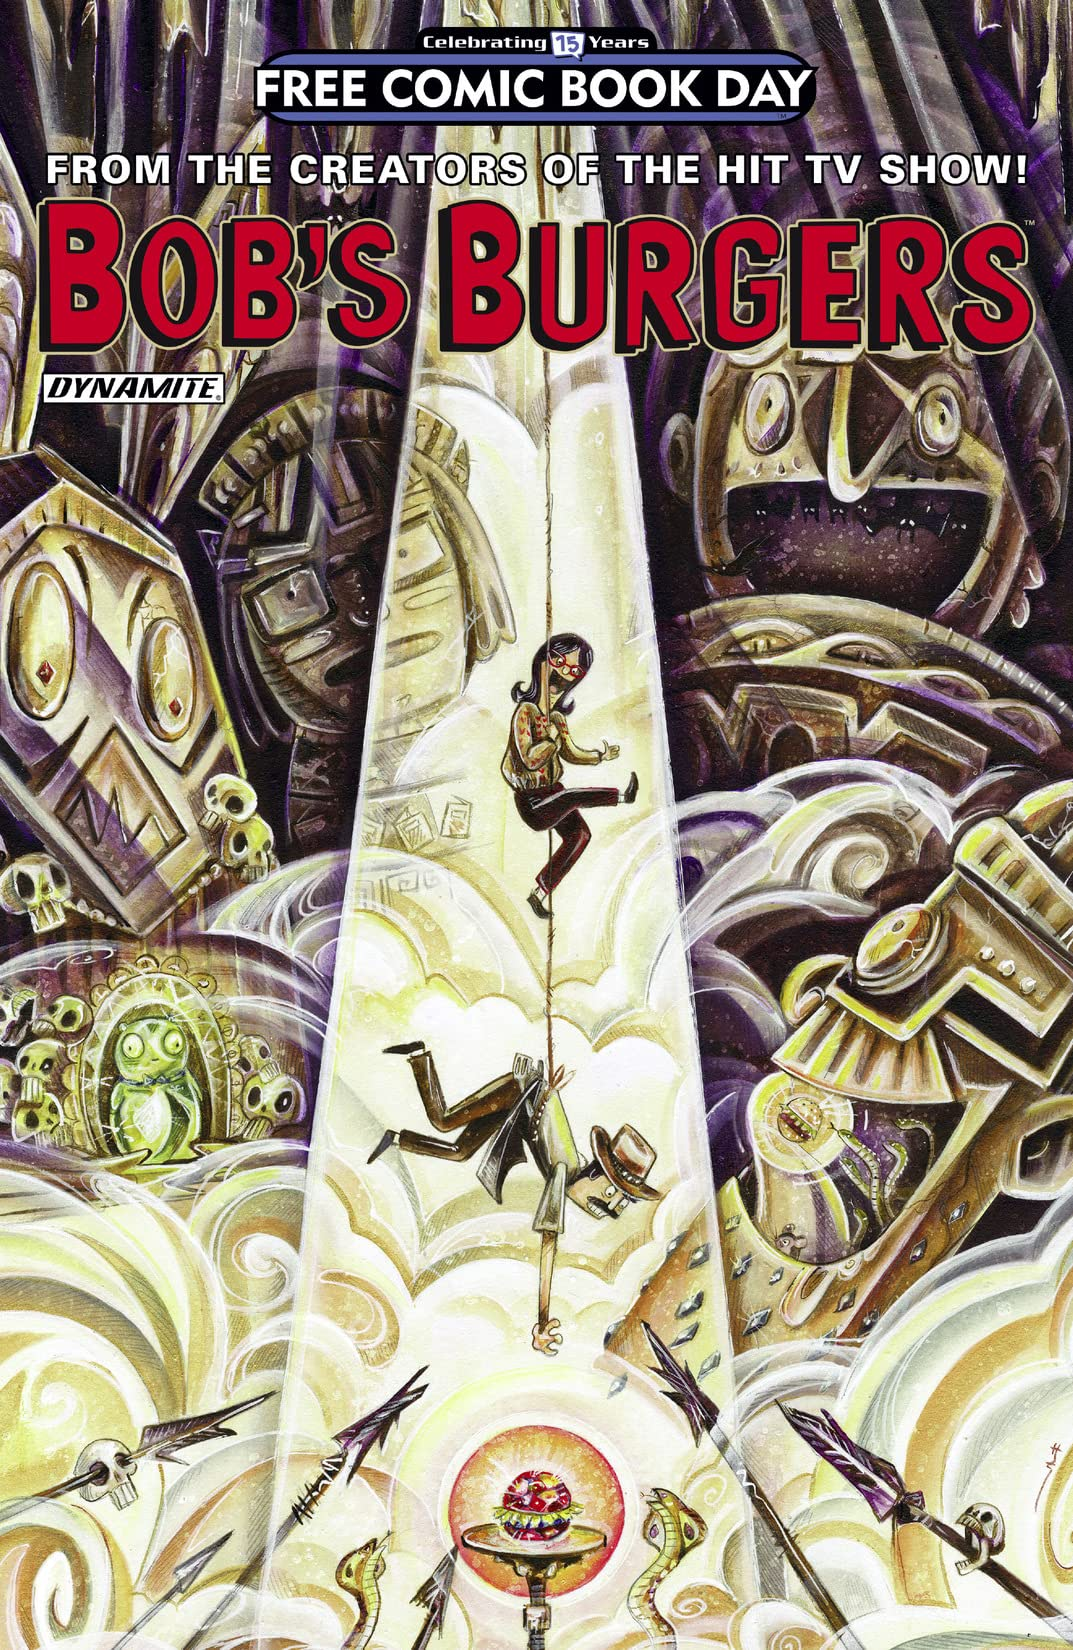 Bob's Burgers – FCBD 2016 Edition